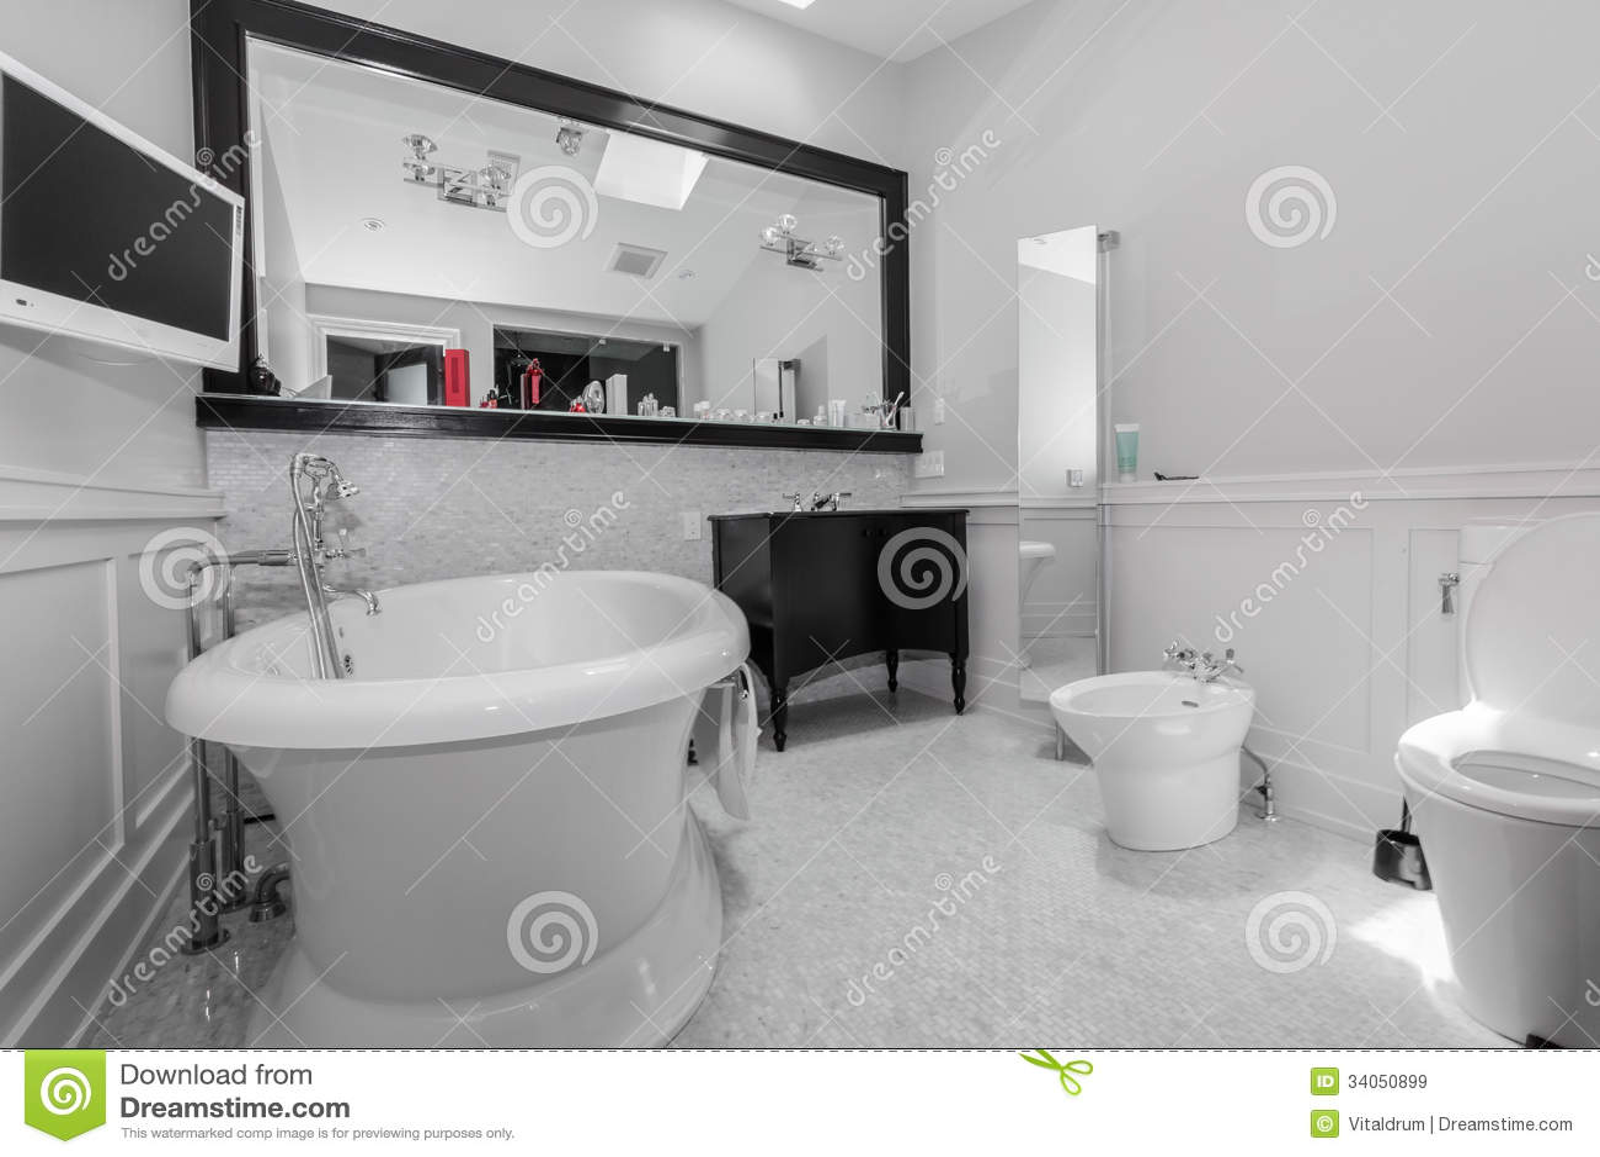 Big Stylish Classic Bathroom Royalty Free Stock Images